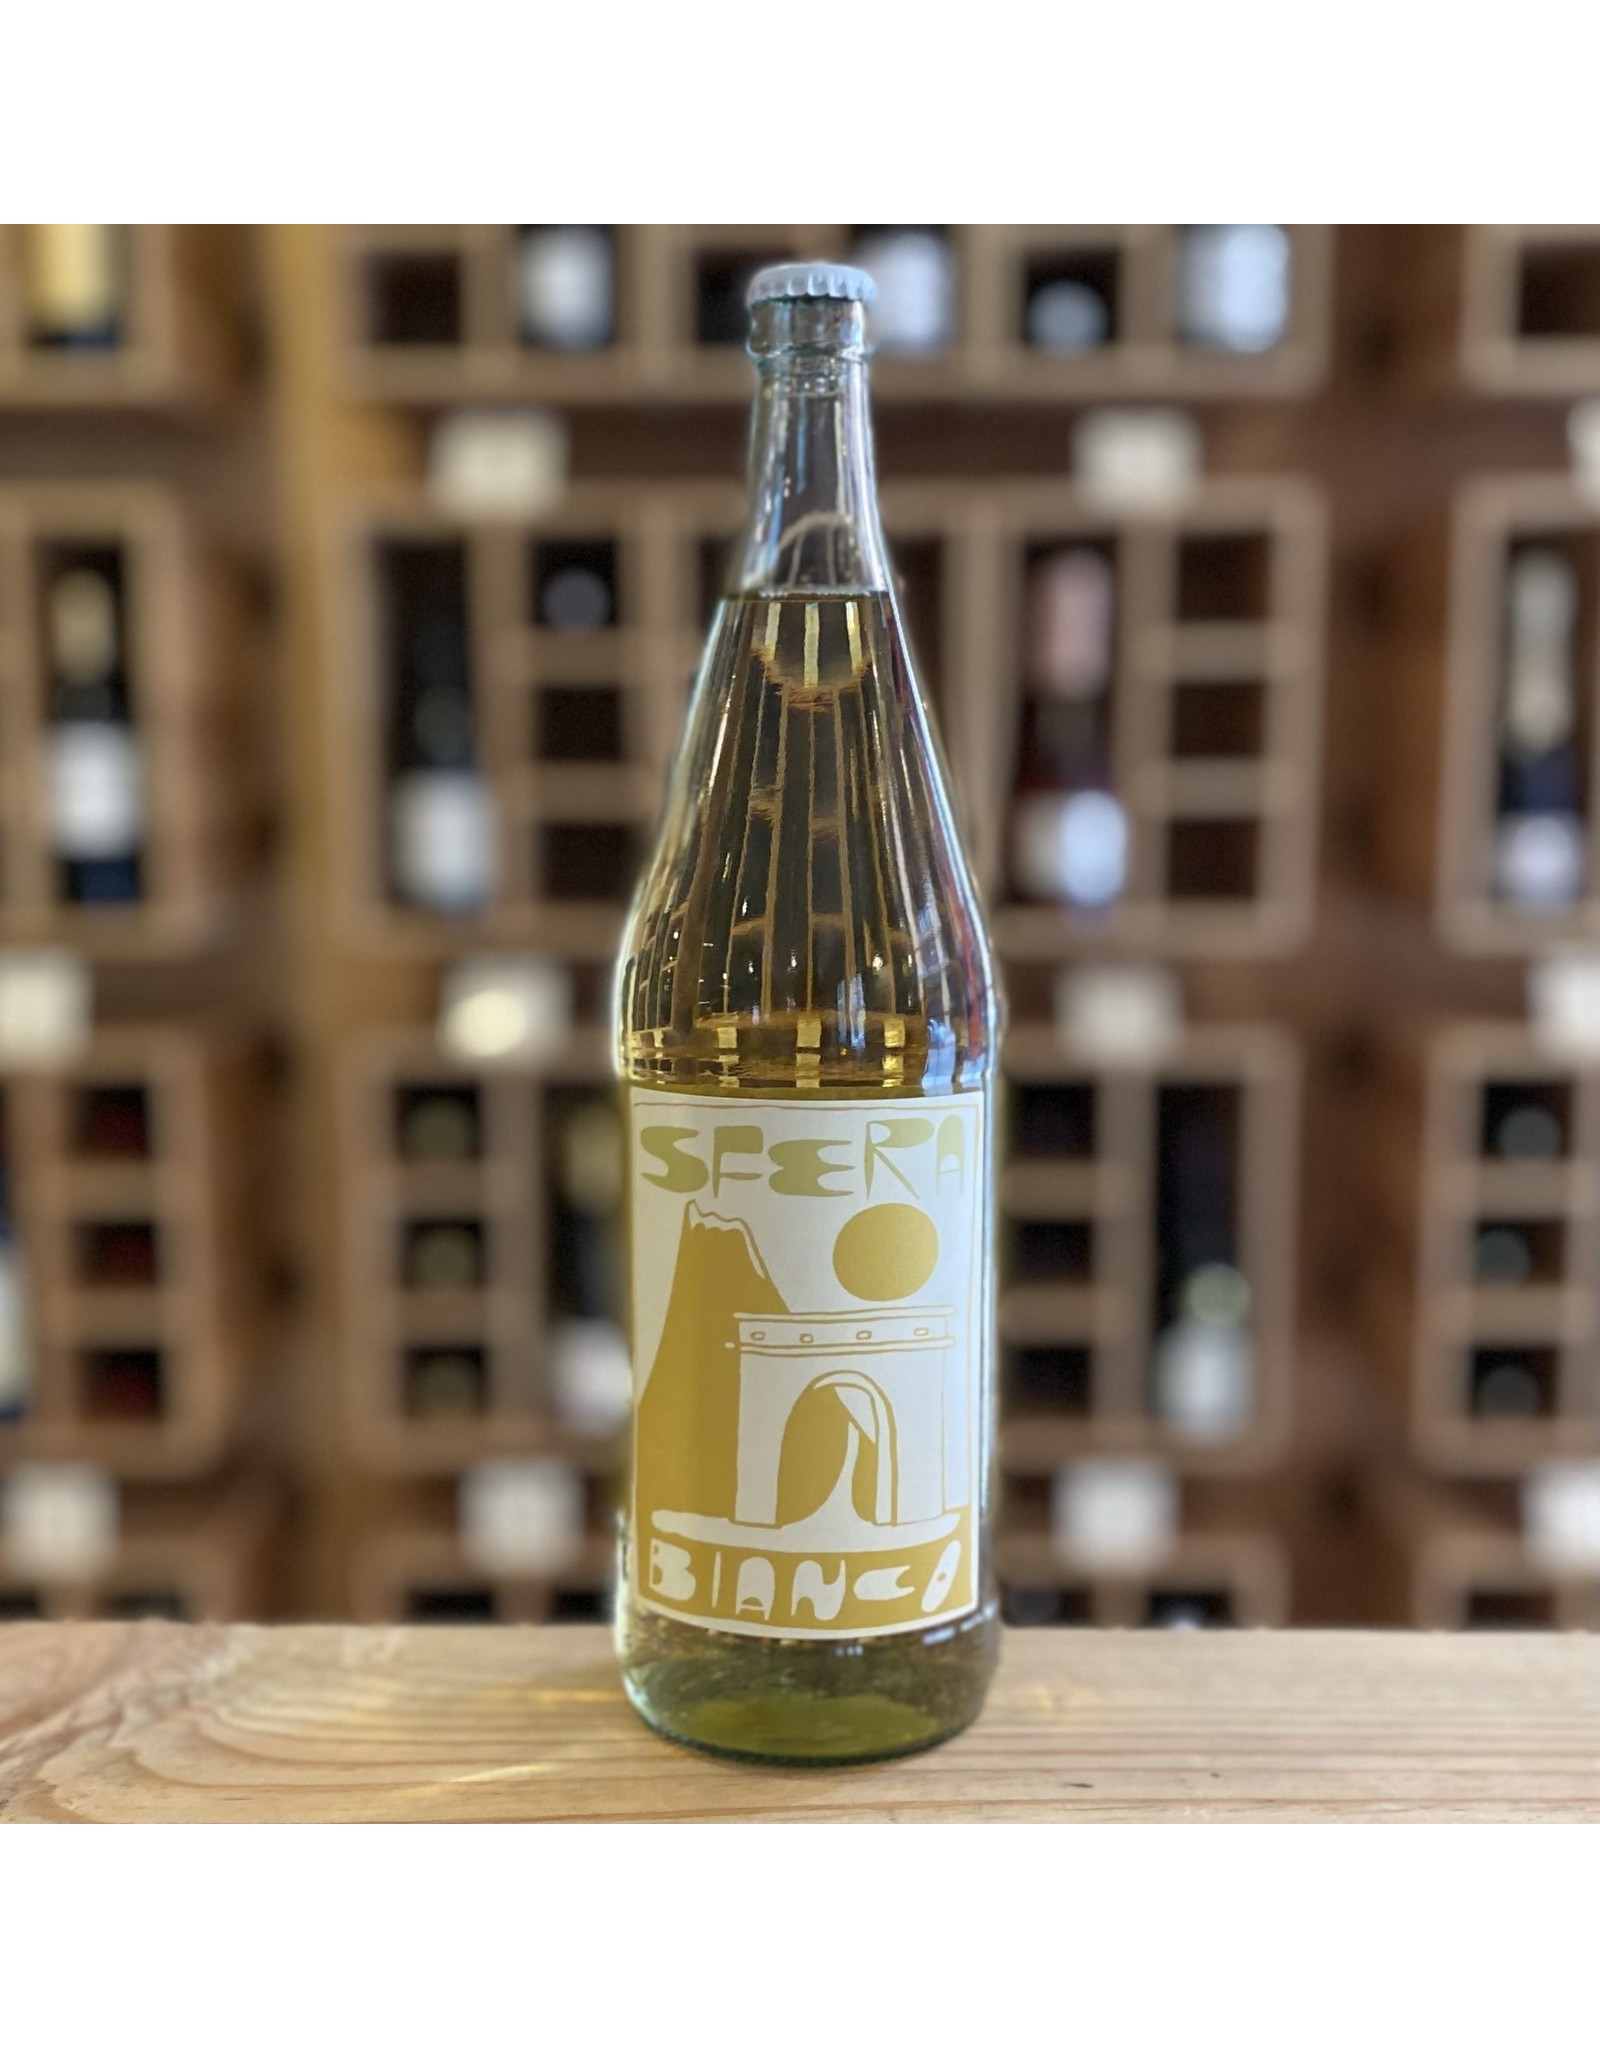 Organic Sfera Vino Bianco 2020 Liter - Italy